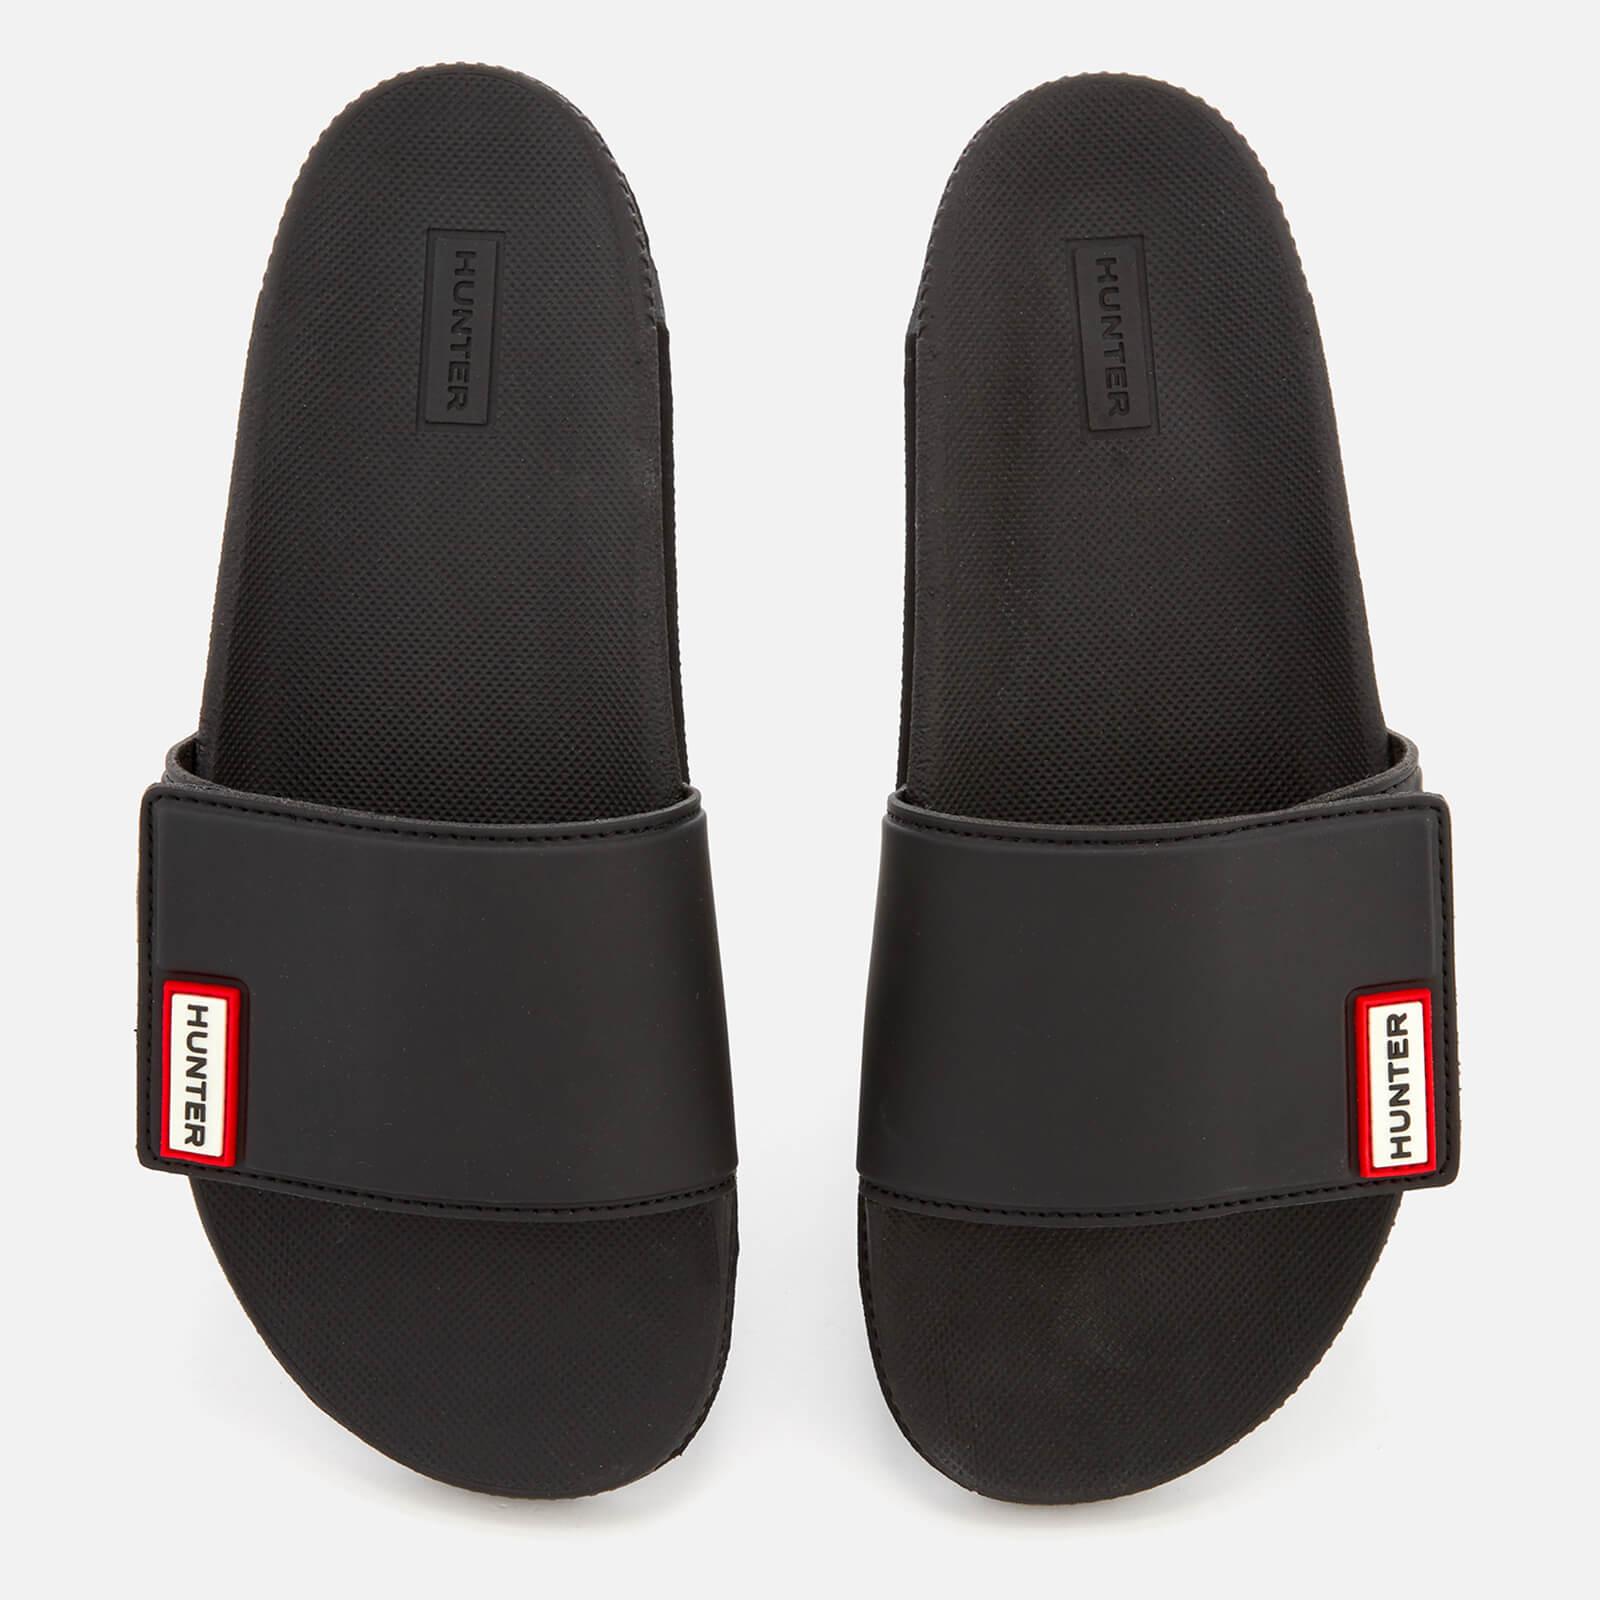 4500cdfbc0b Hunter Women s Original Adjustable Slide Sandals - Black Womens Footwear